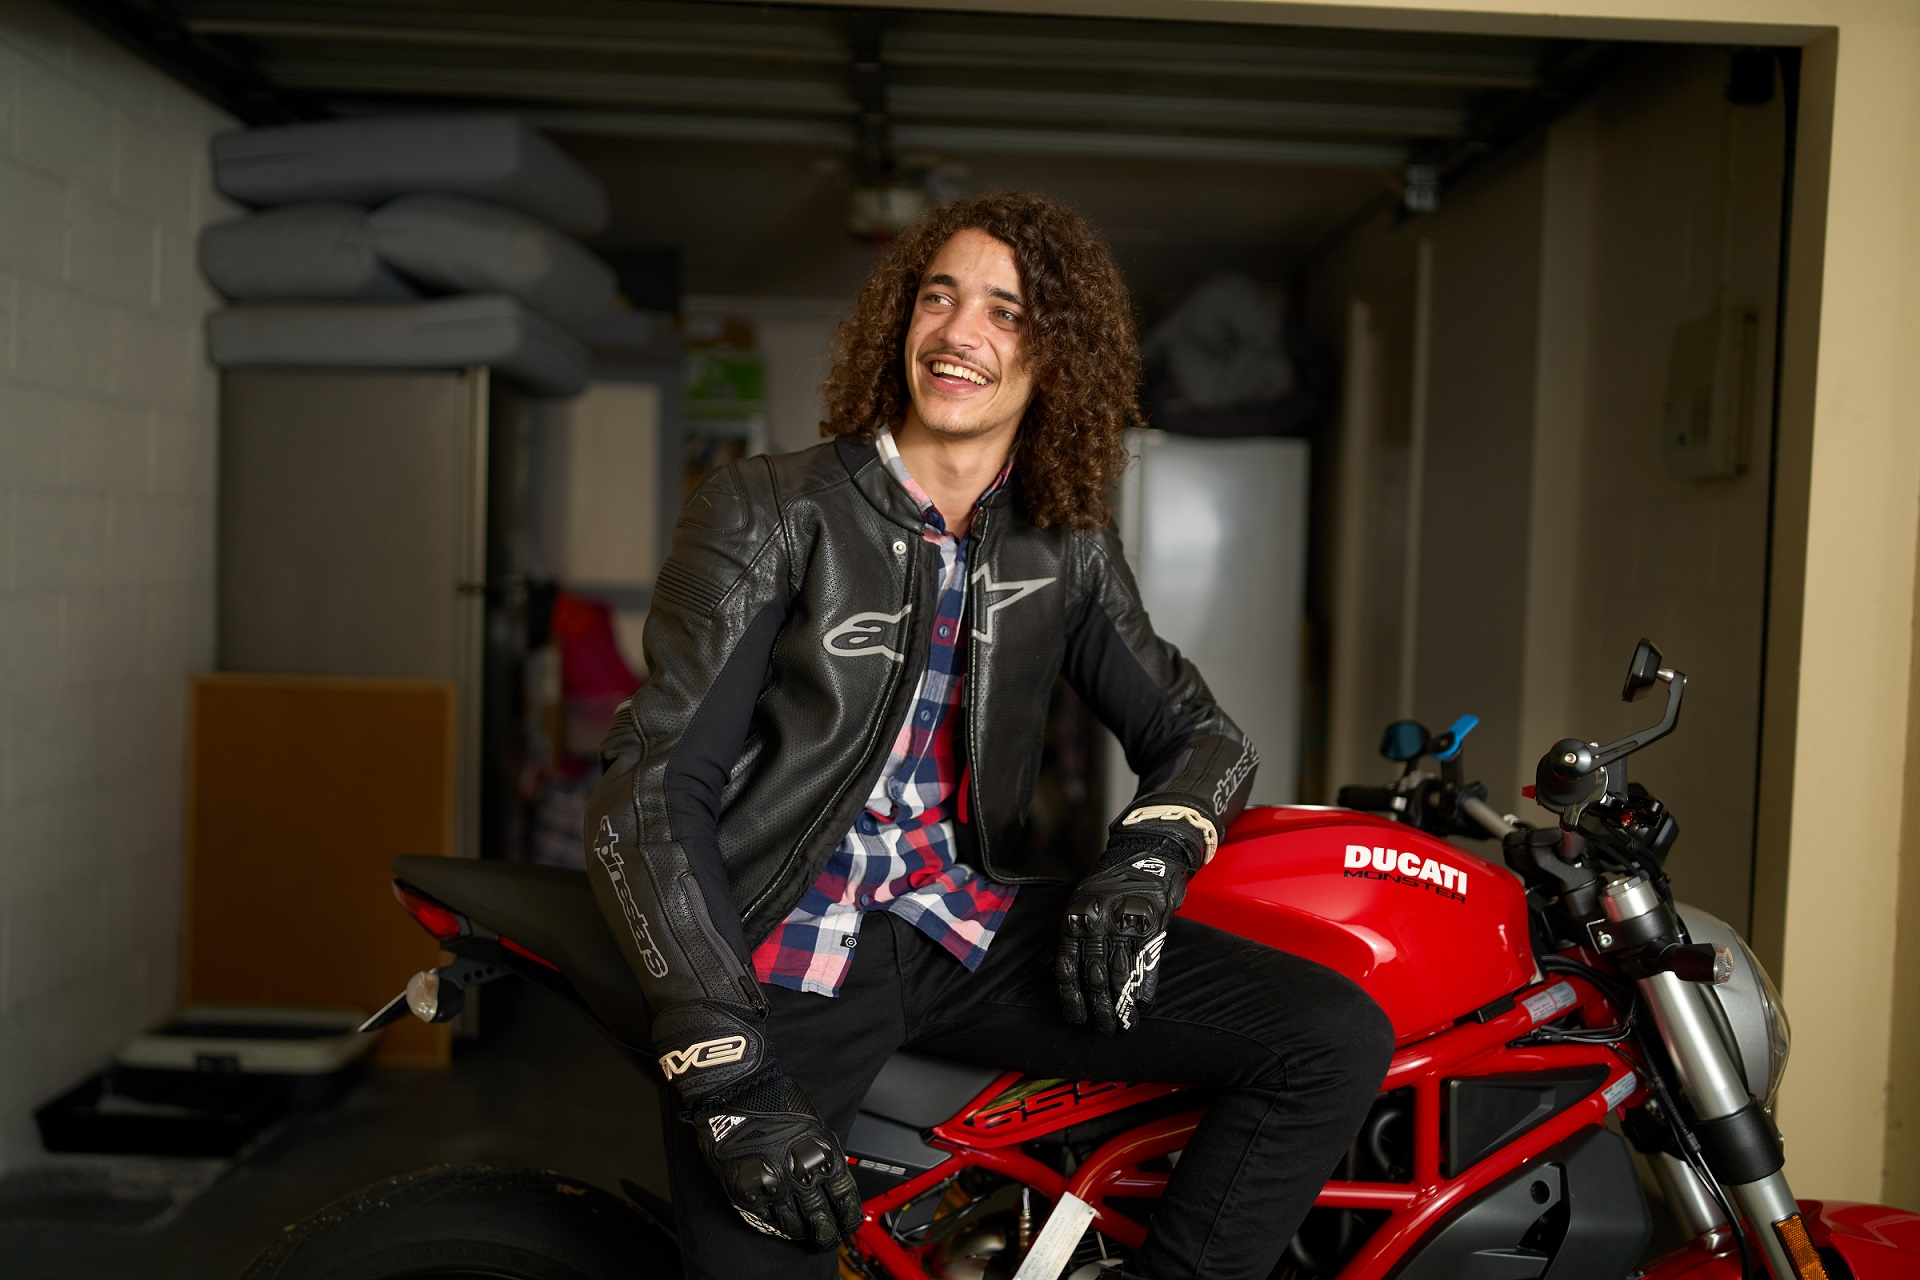 Alex on his motorbike